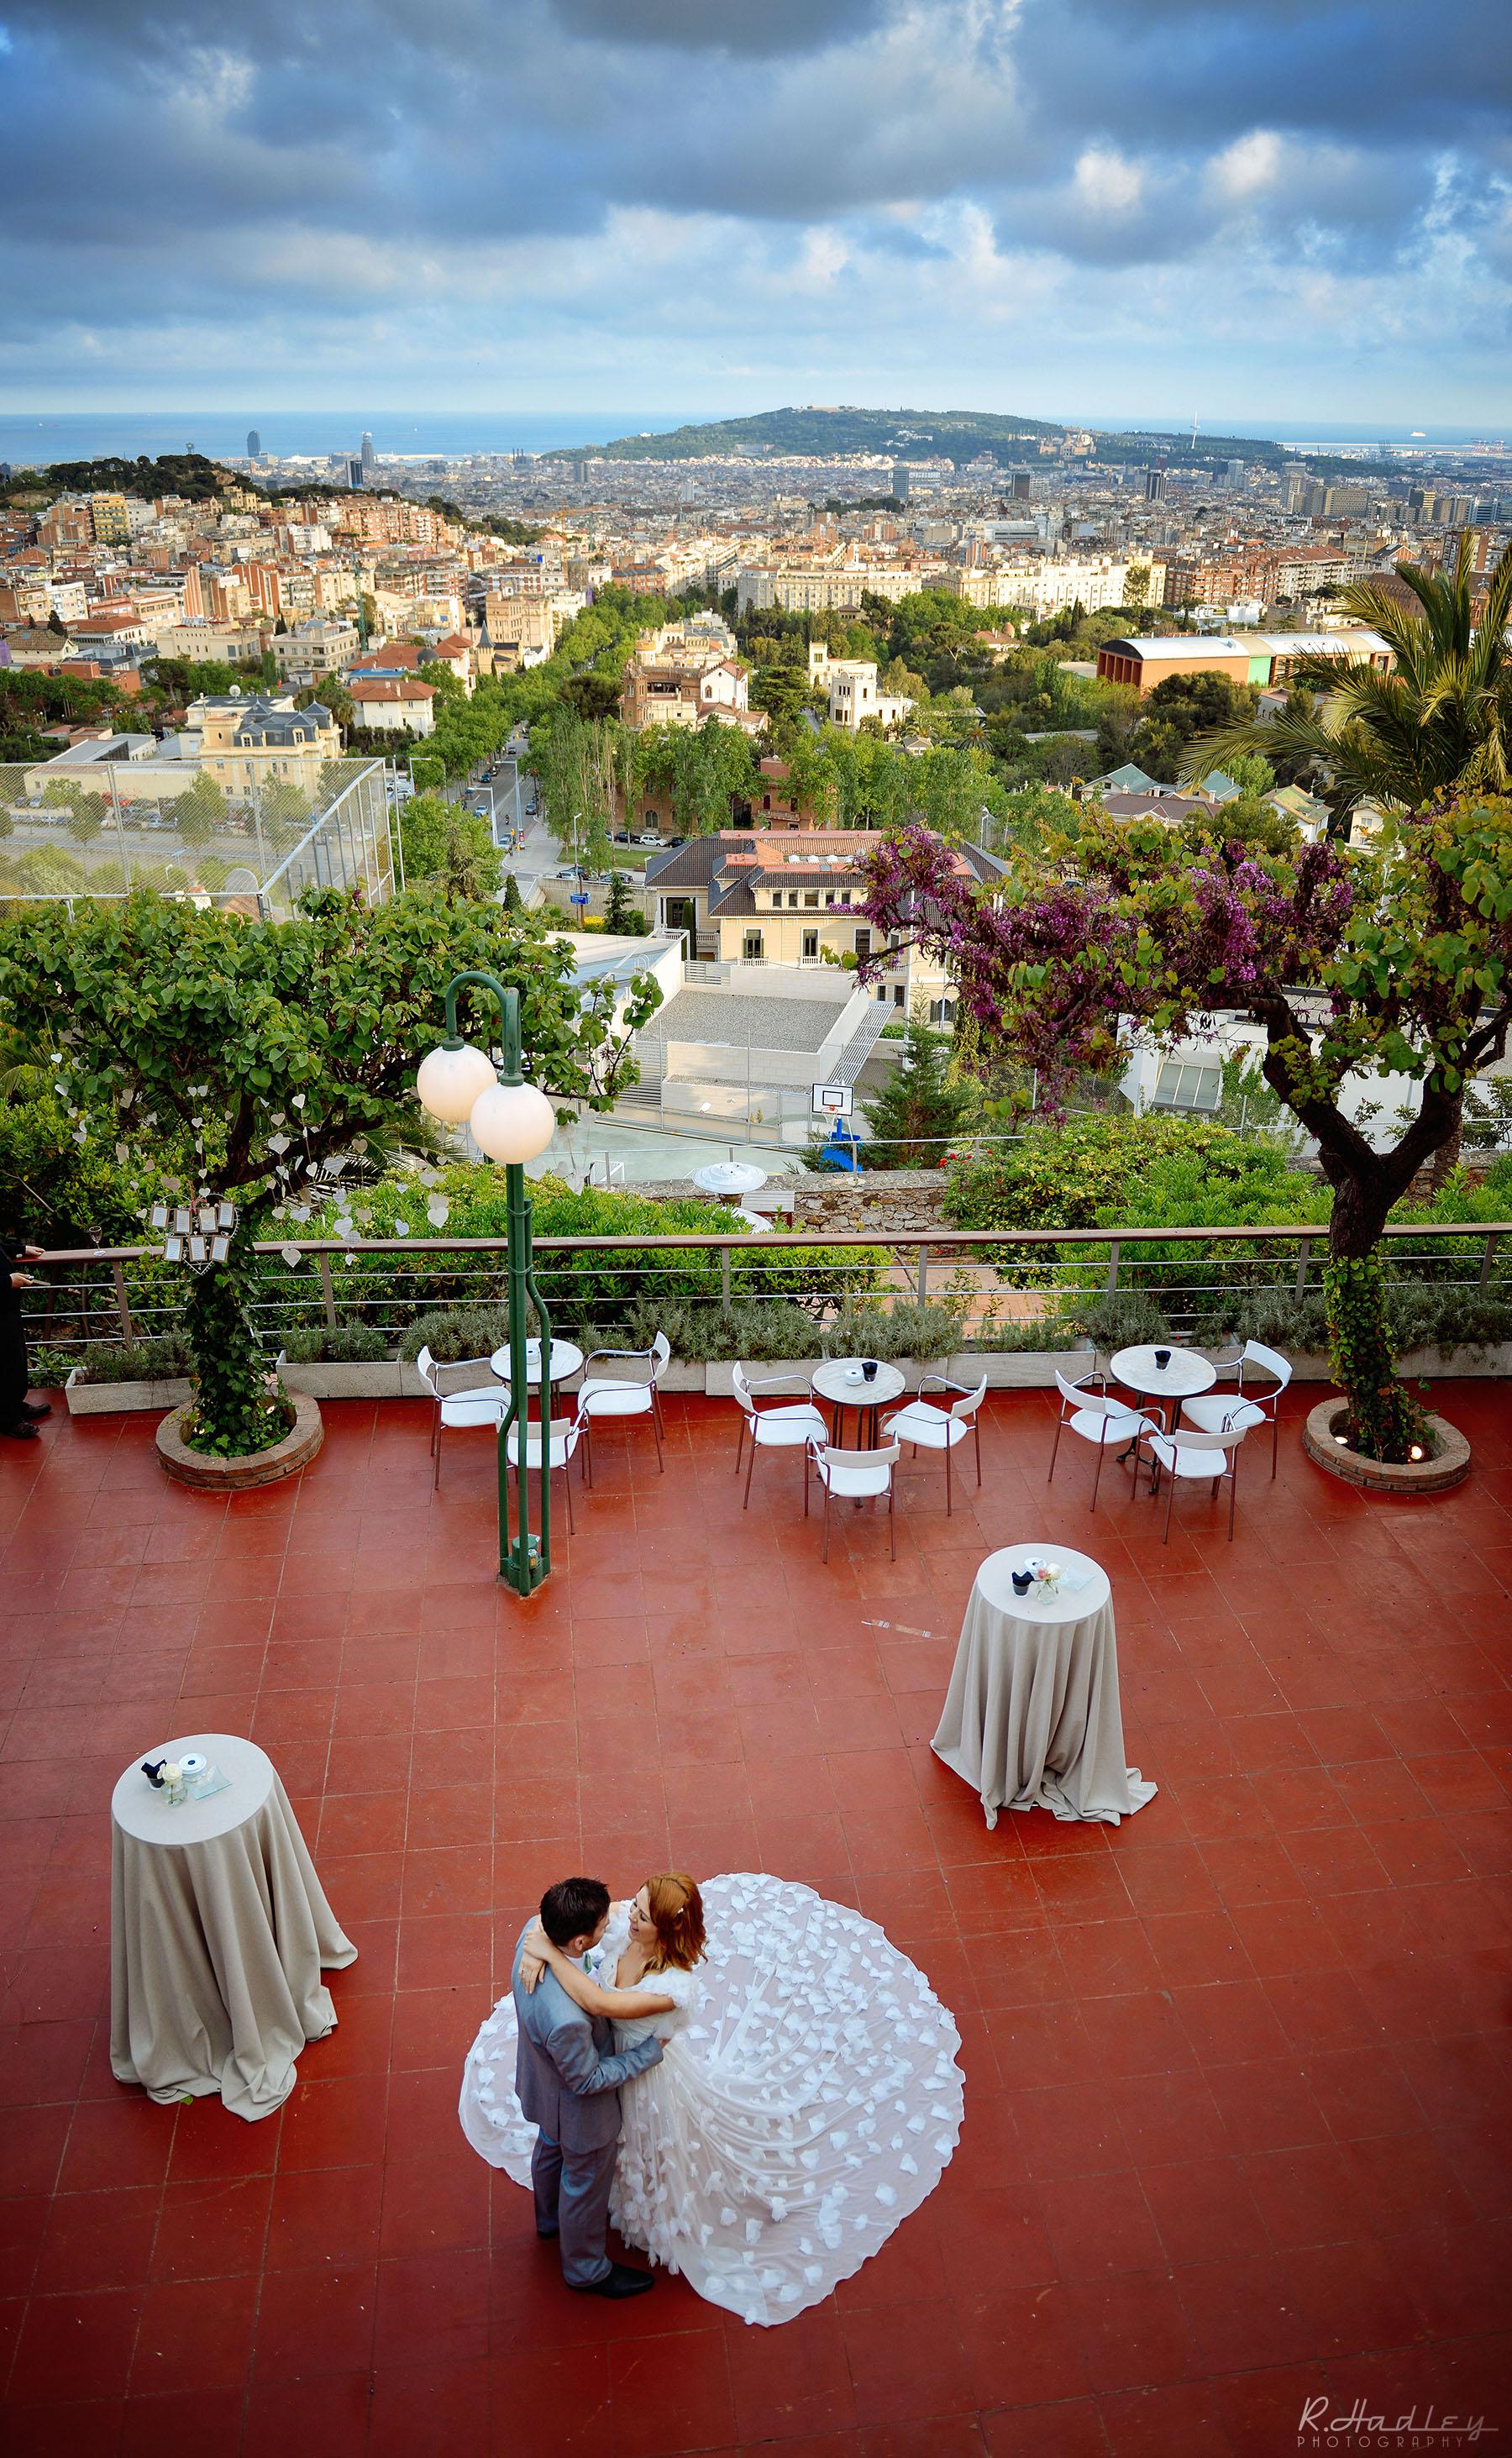 Wedding of Timmy and Sarah at Santa Anna Church and Restaurant Mirabe, Barcelona.